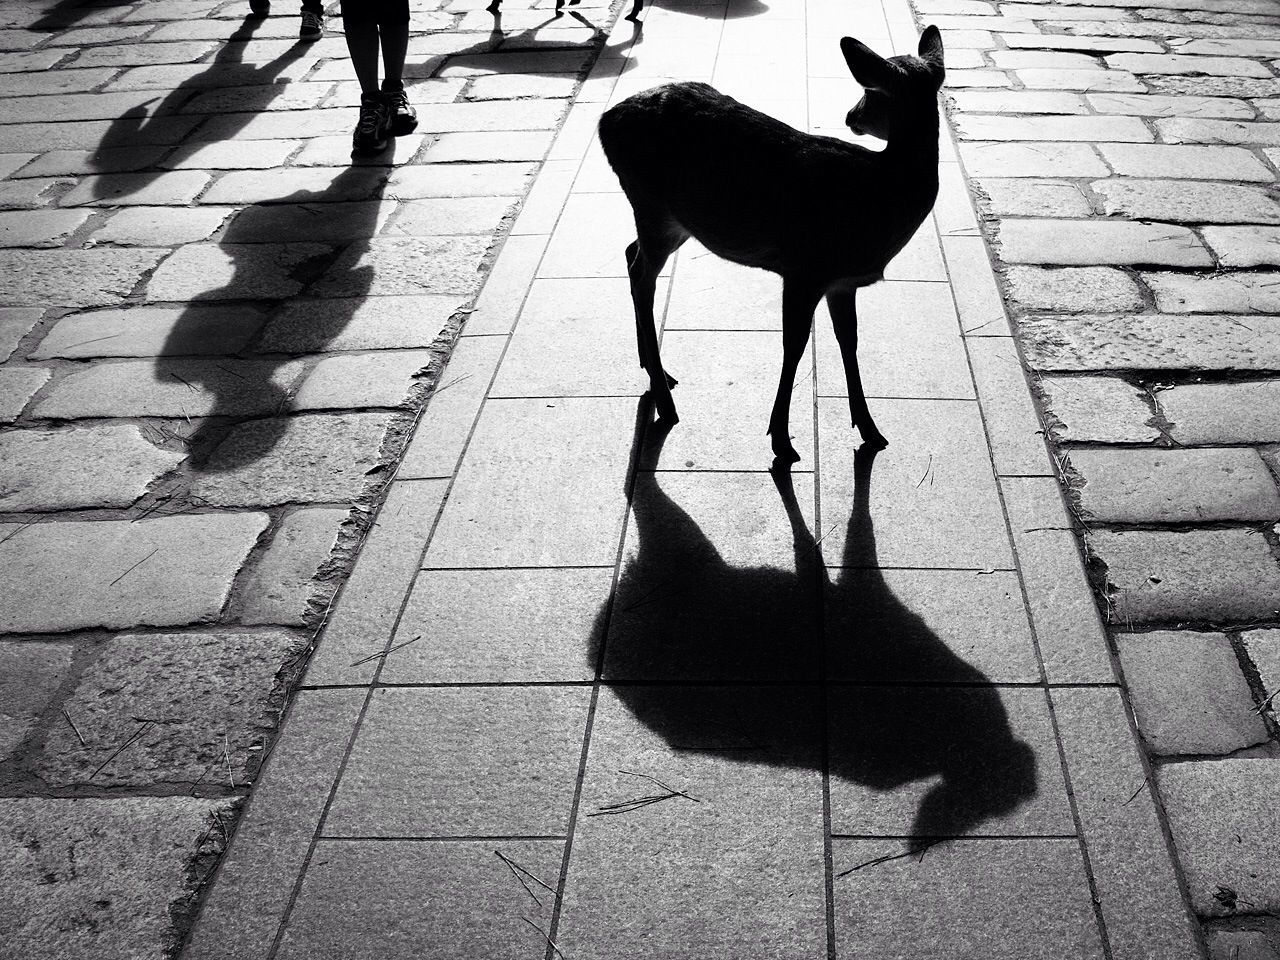 Deer standing on pavement